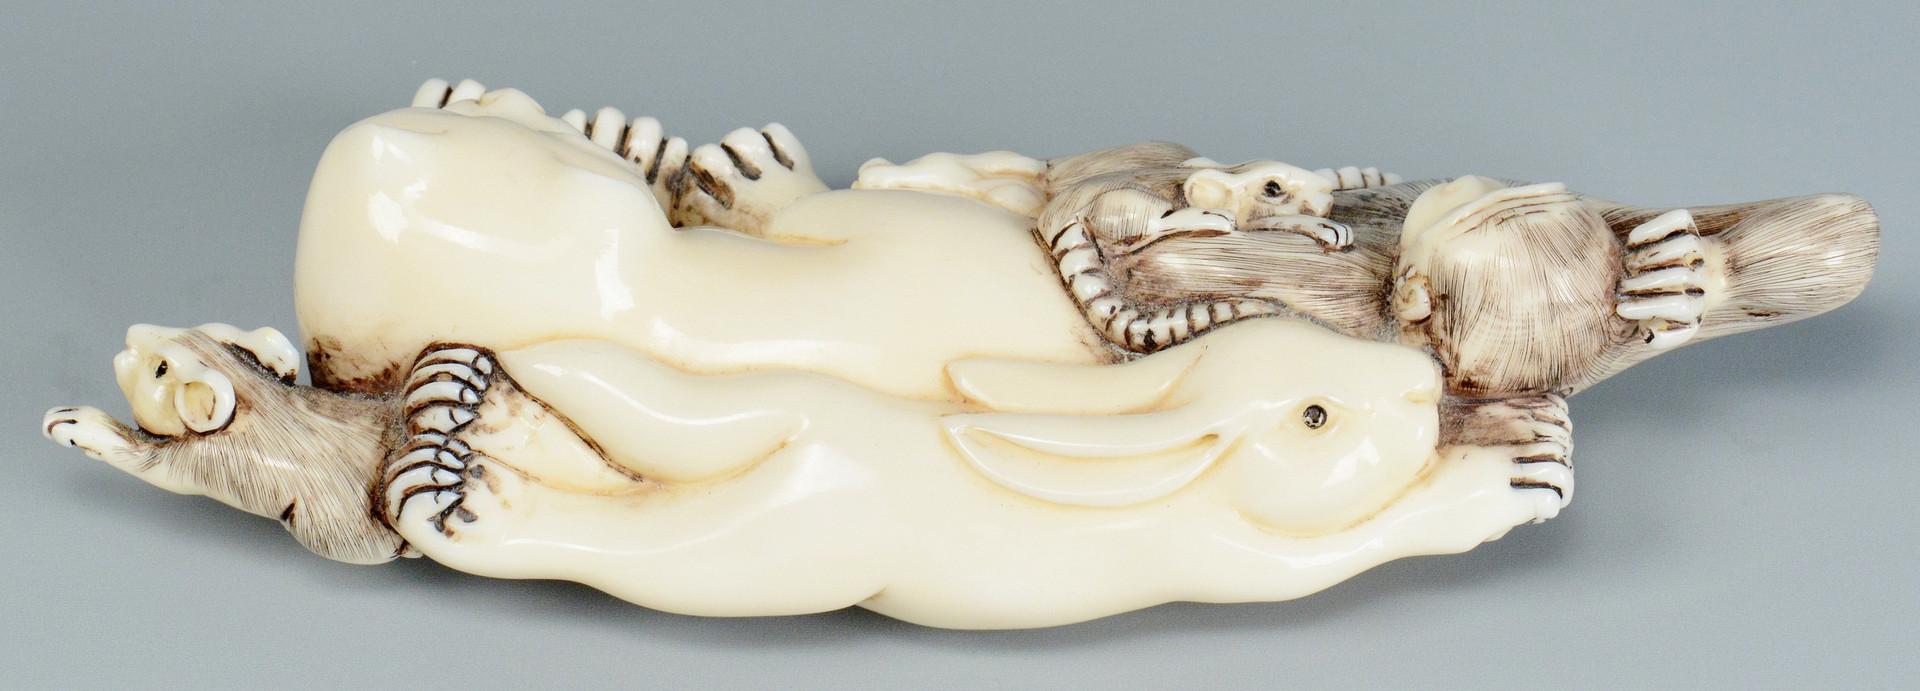 Lot 250: 3 Carved Japanese ivory Netsukes